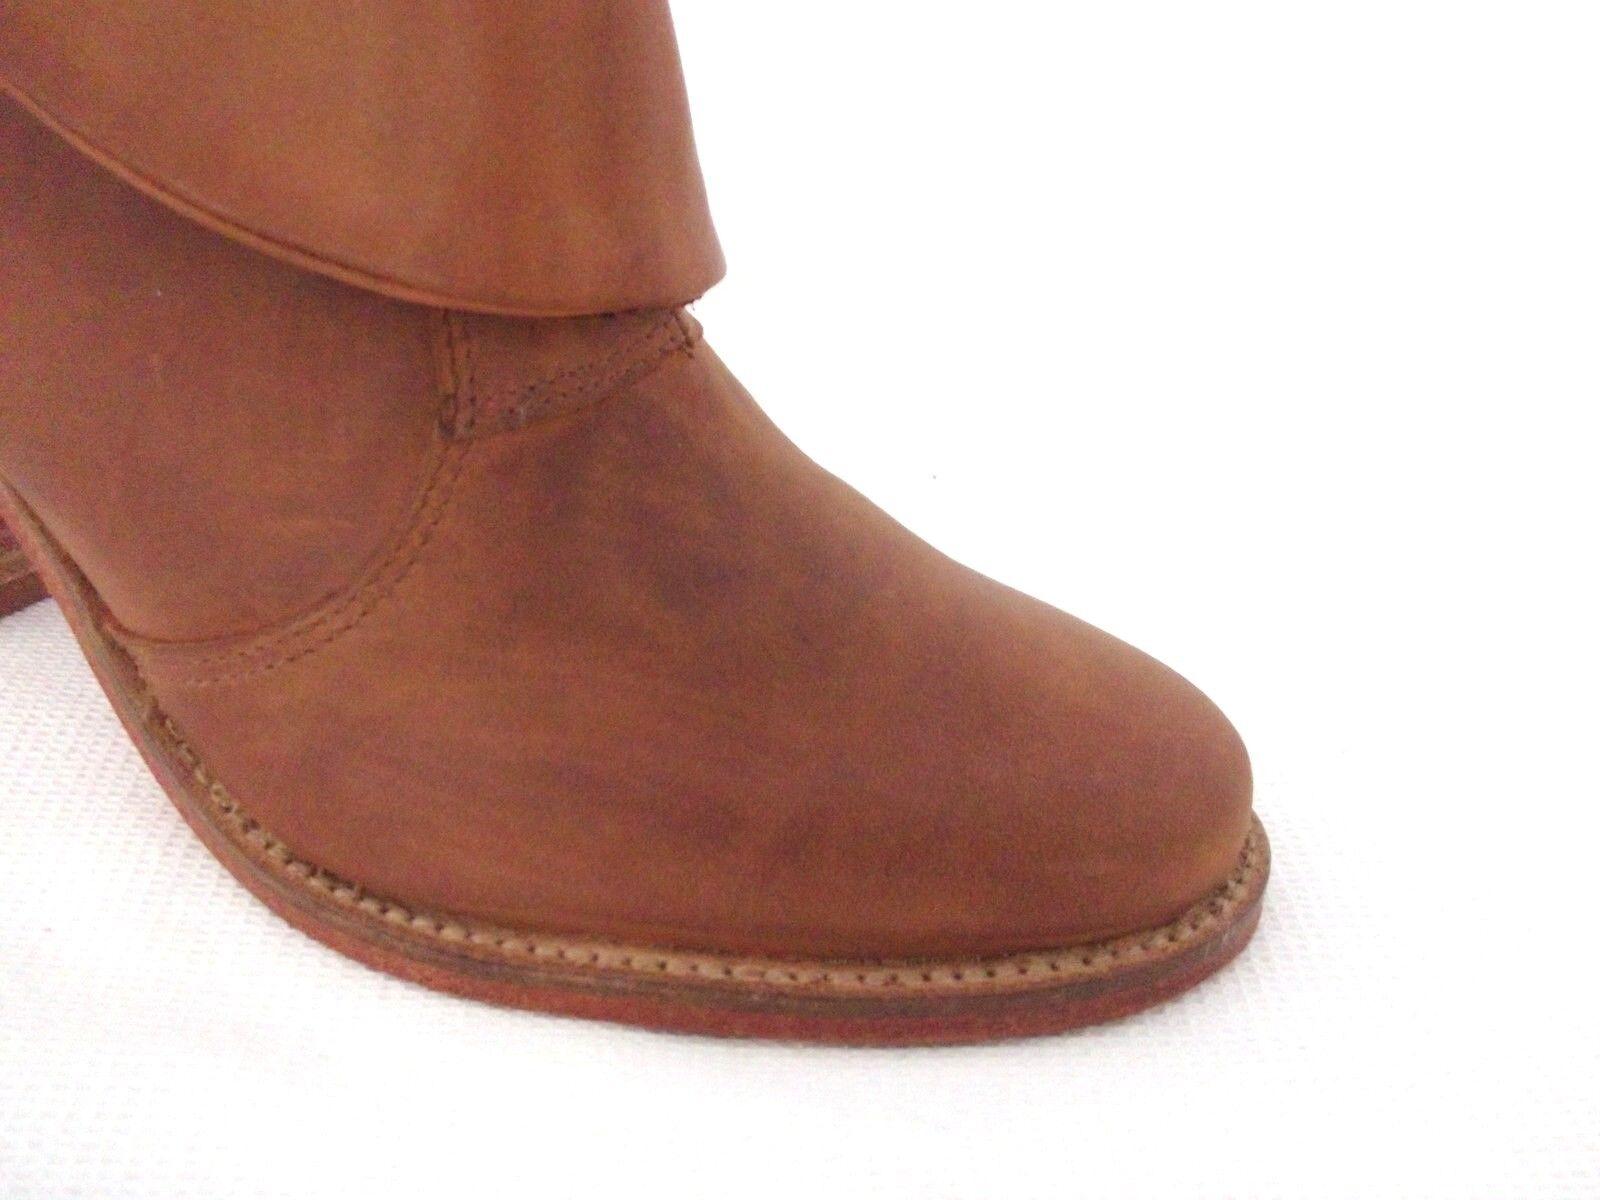 J UK Schuhe LADIES BROWN-TAN DESTRESSED LEATHER ANKLE Stiefel DamenschuheS UK J 4 - EUR 37 1d107b